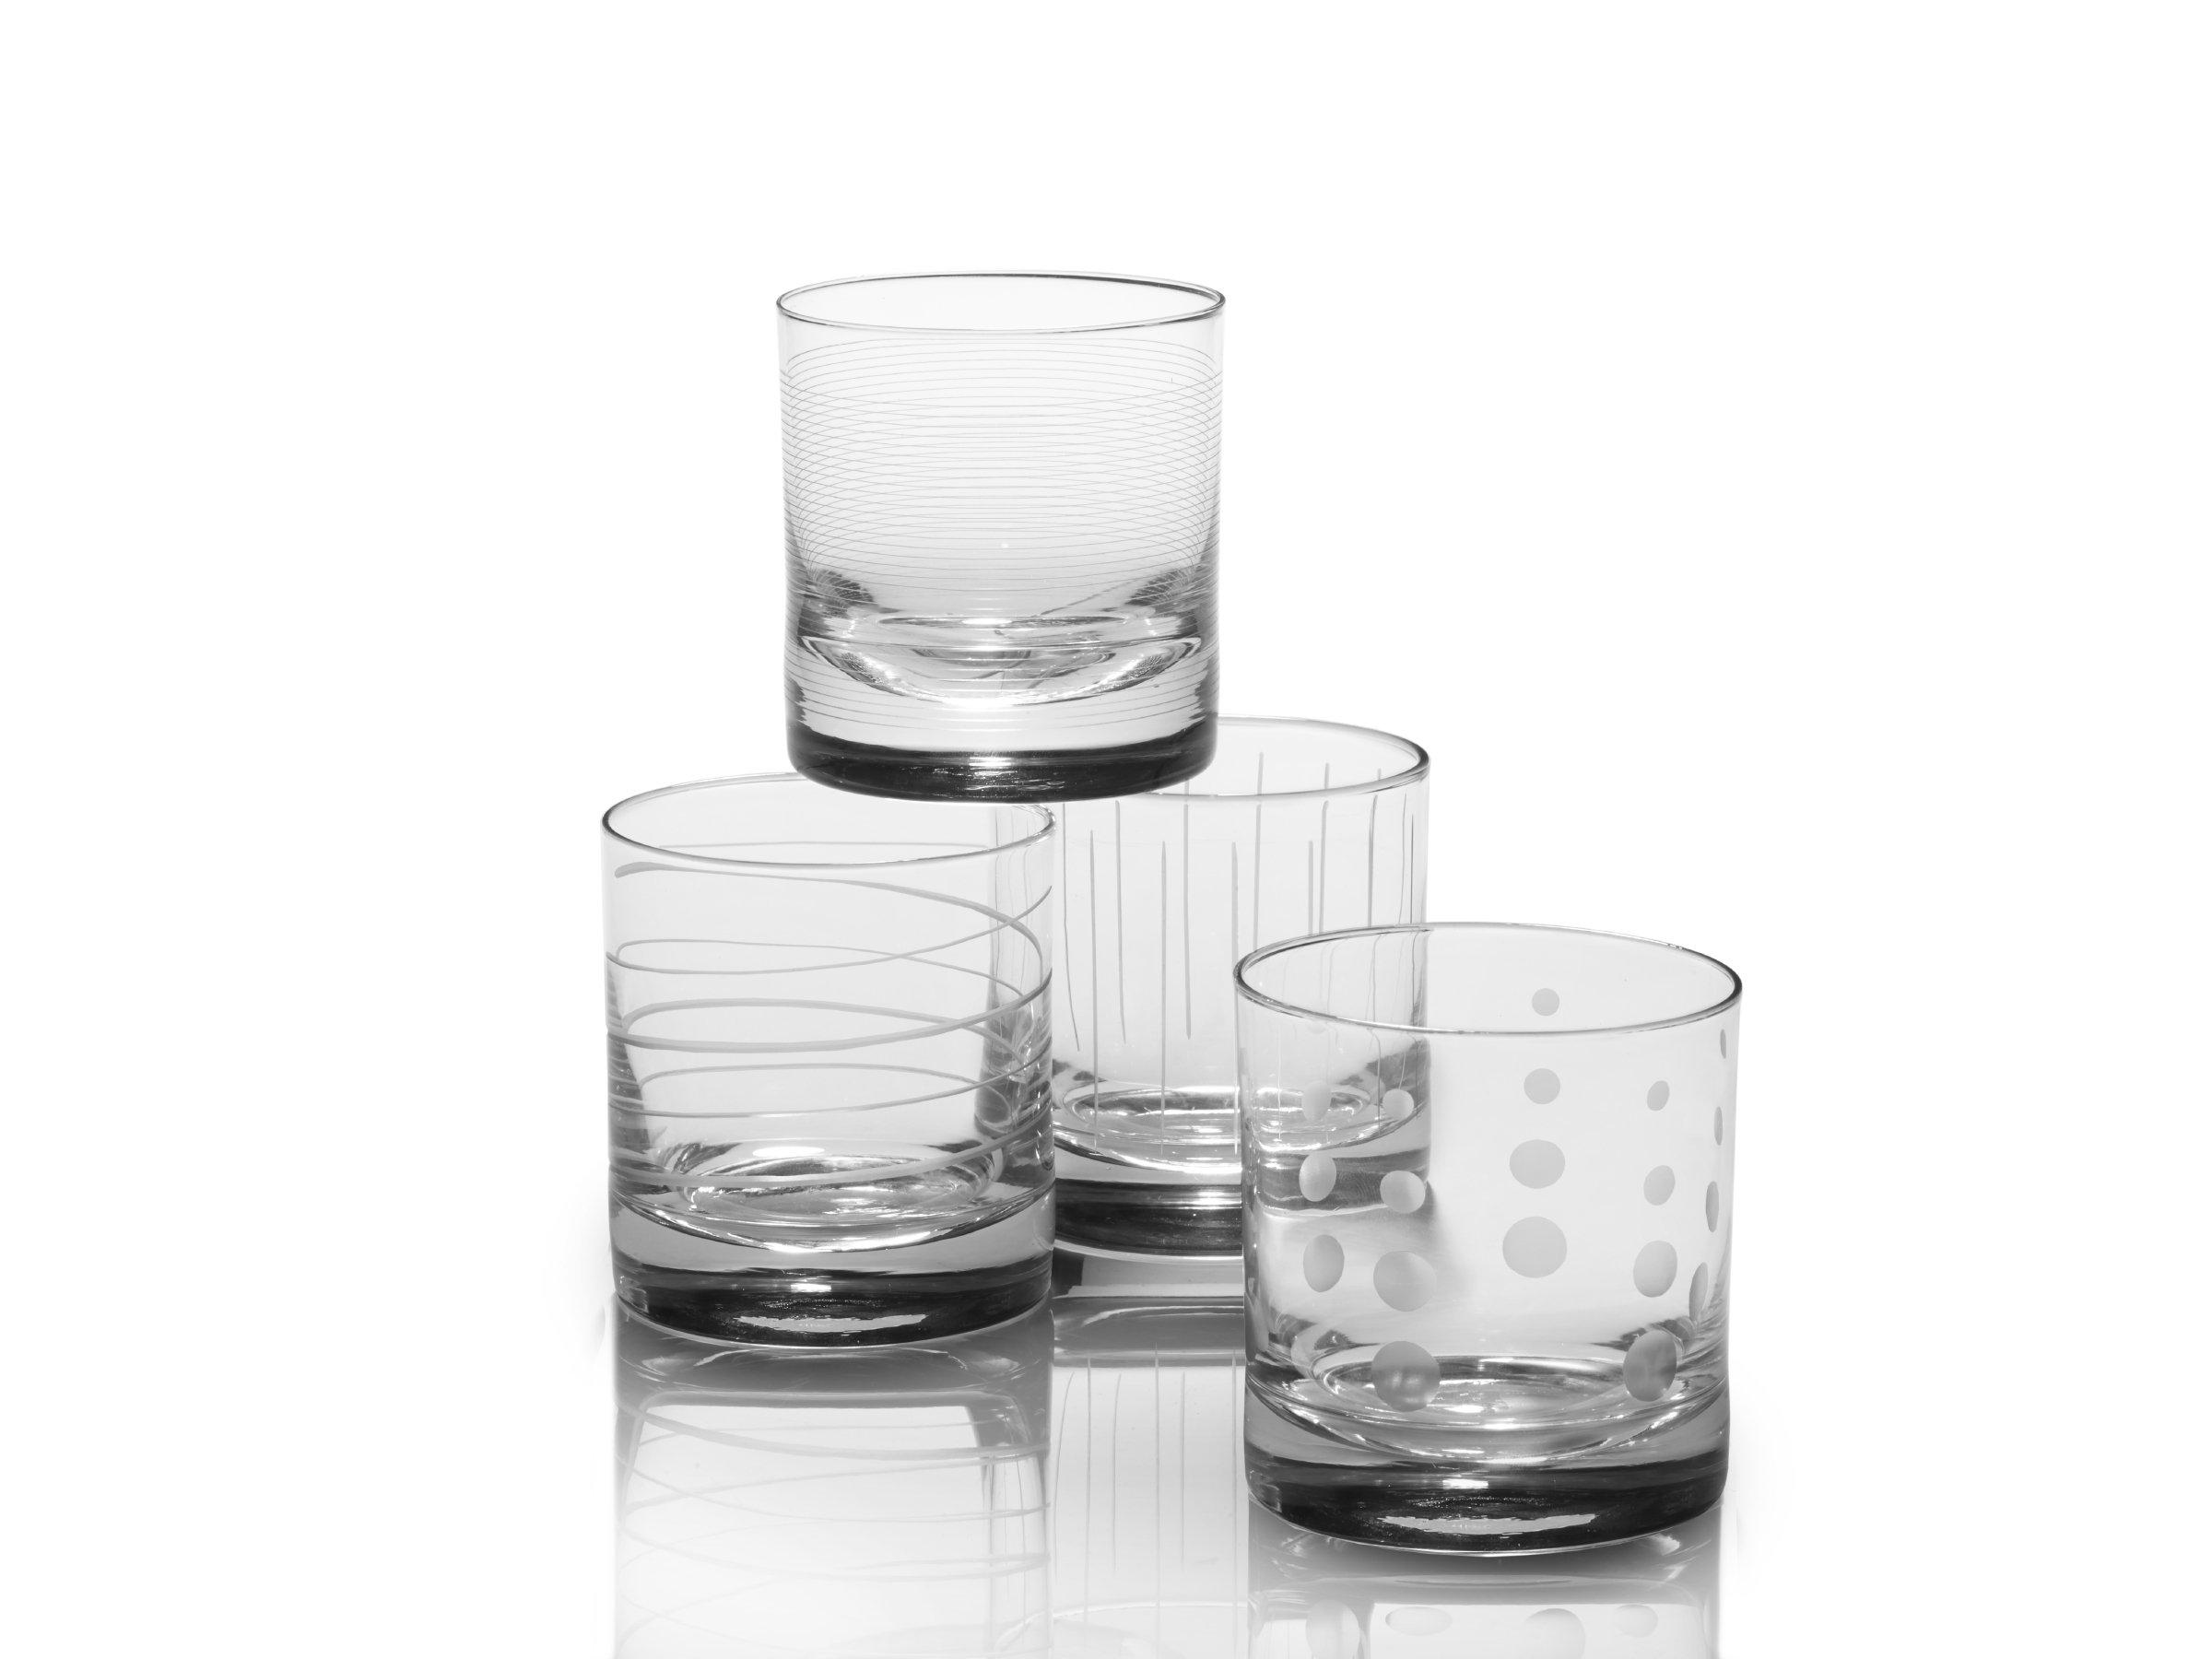 Mikasa Cheers Glass, Set of 4